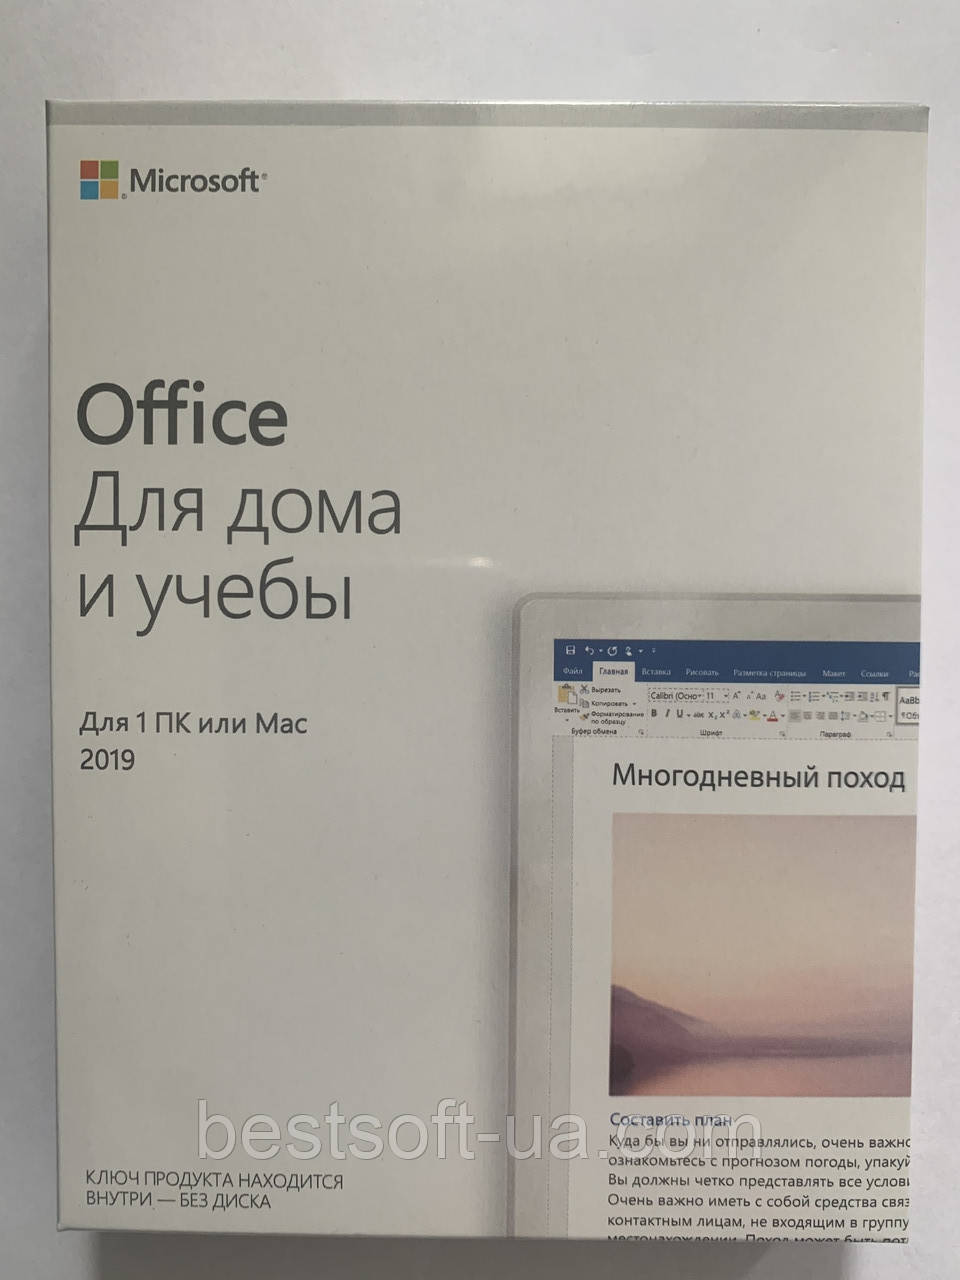 Microsoft Office 2019 для Дома и учёбы, RUS, Box-версия (79G-05089)